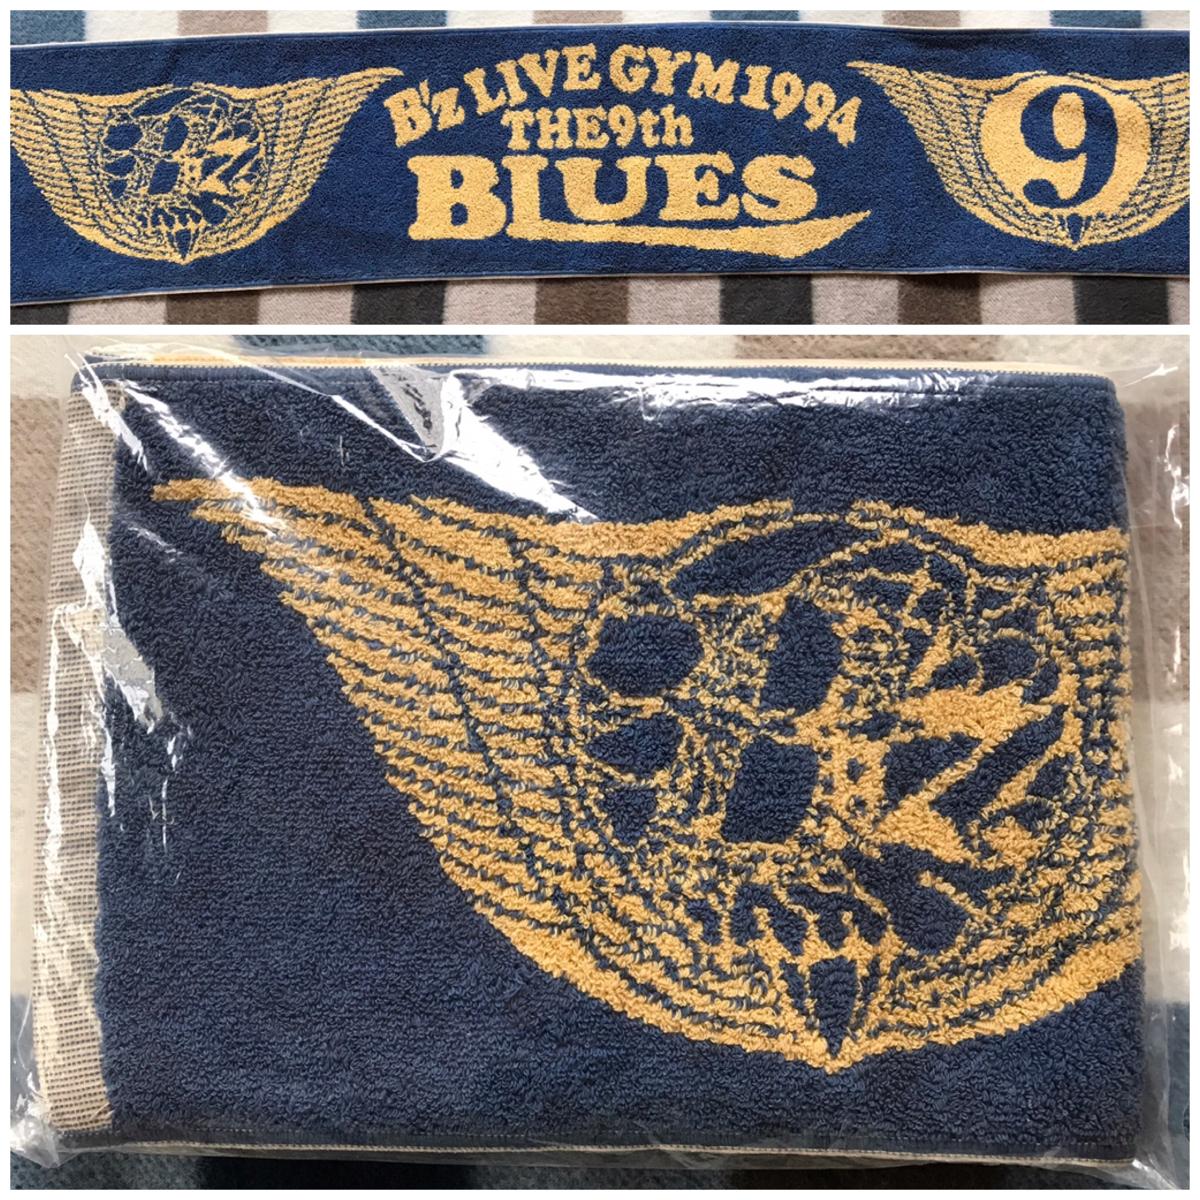 B'z LIVE-GYM 1994 The 9th Blues タオルマフラー 稲葉浩志 松本孝弘